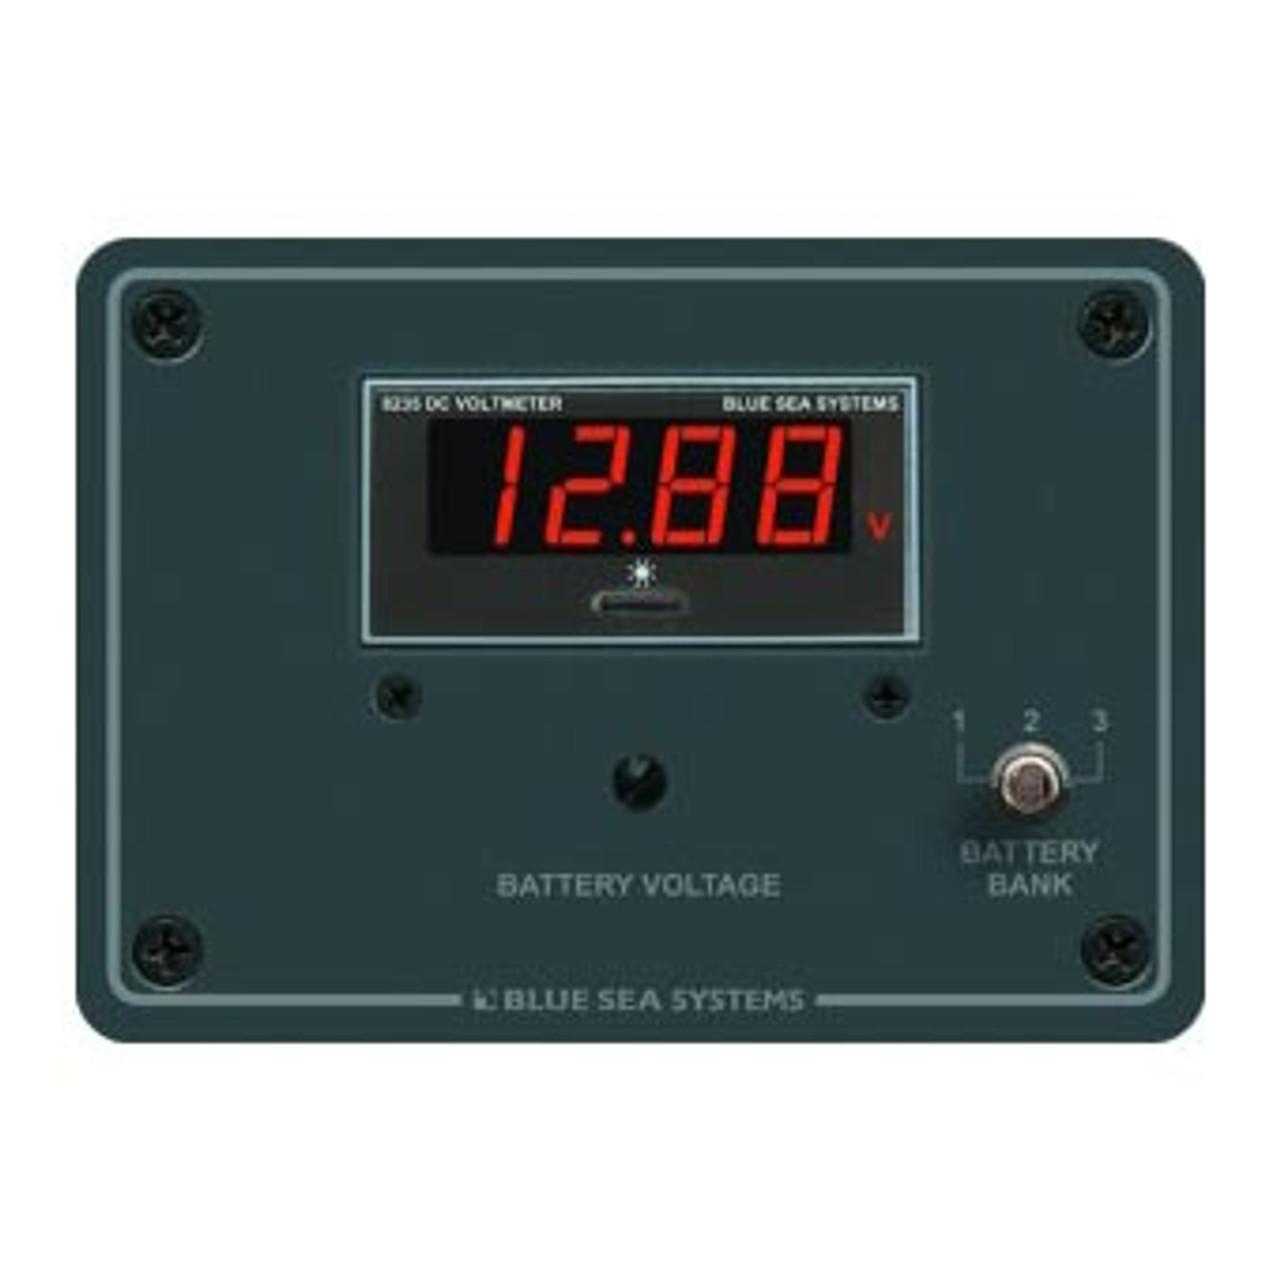 PANEL 7-60VDC 3 BLANK DIGITAL